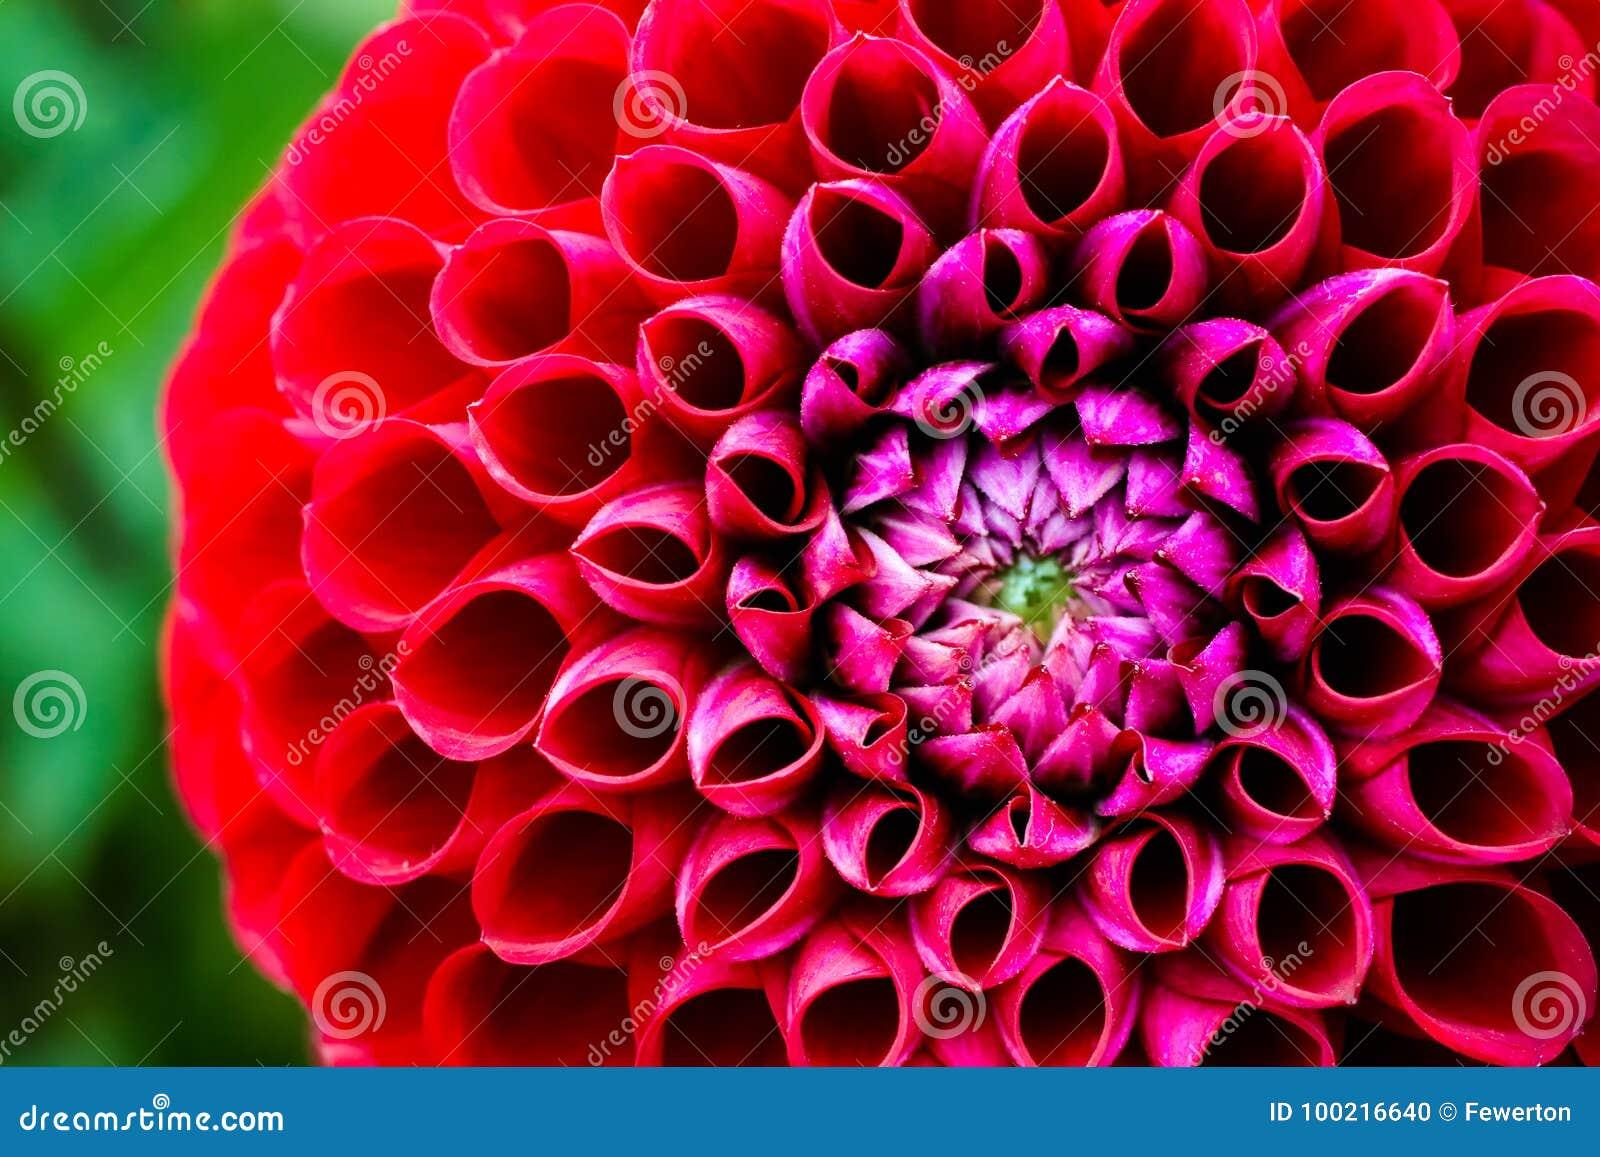 Red dahlia flower stock photo image of ball light 100216640 red dahlia flower izmirmasajfo